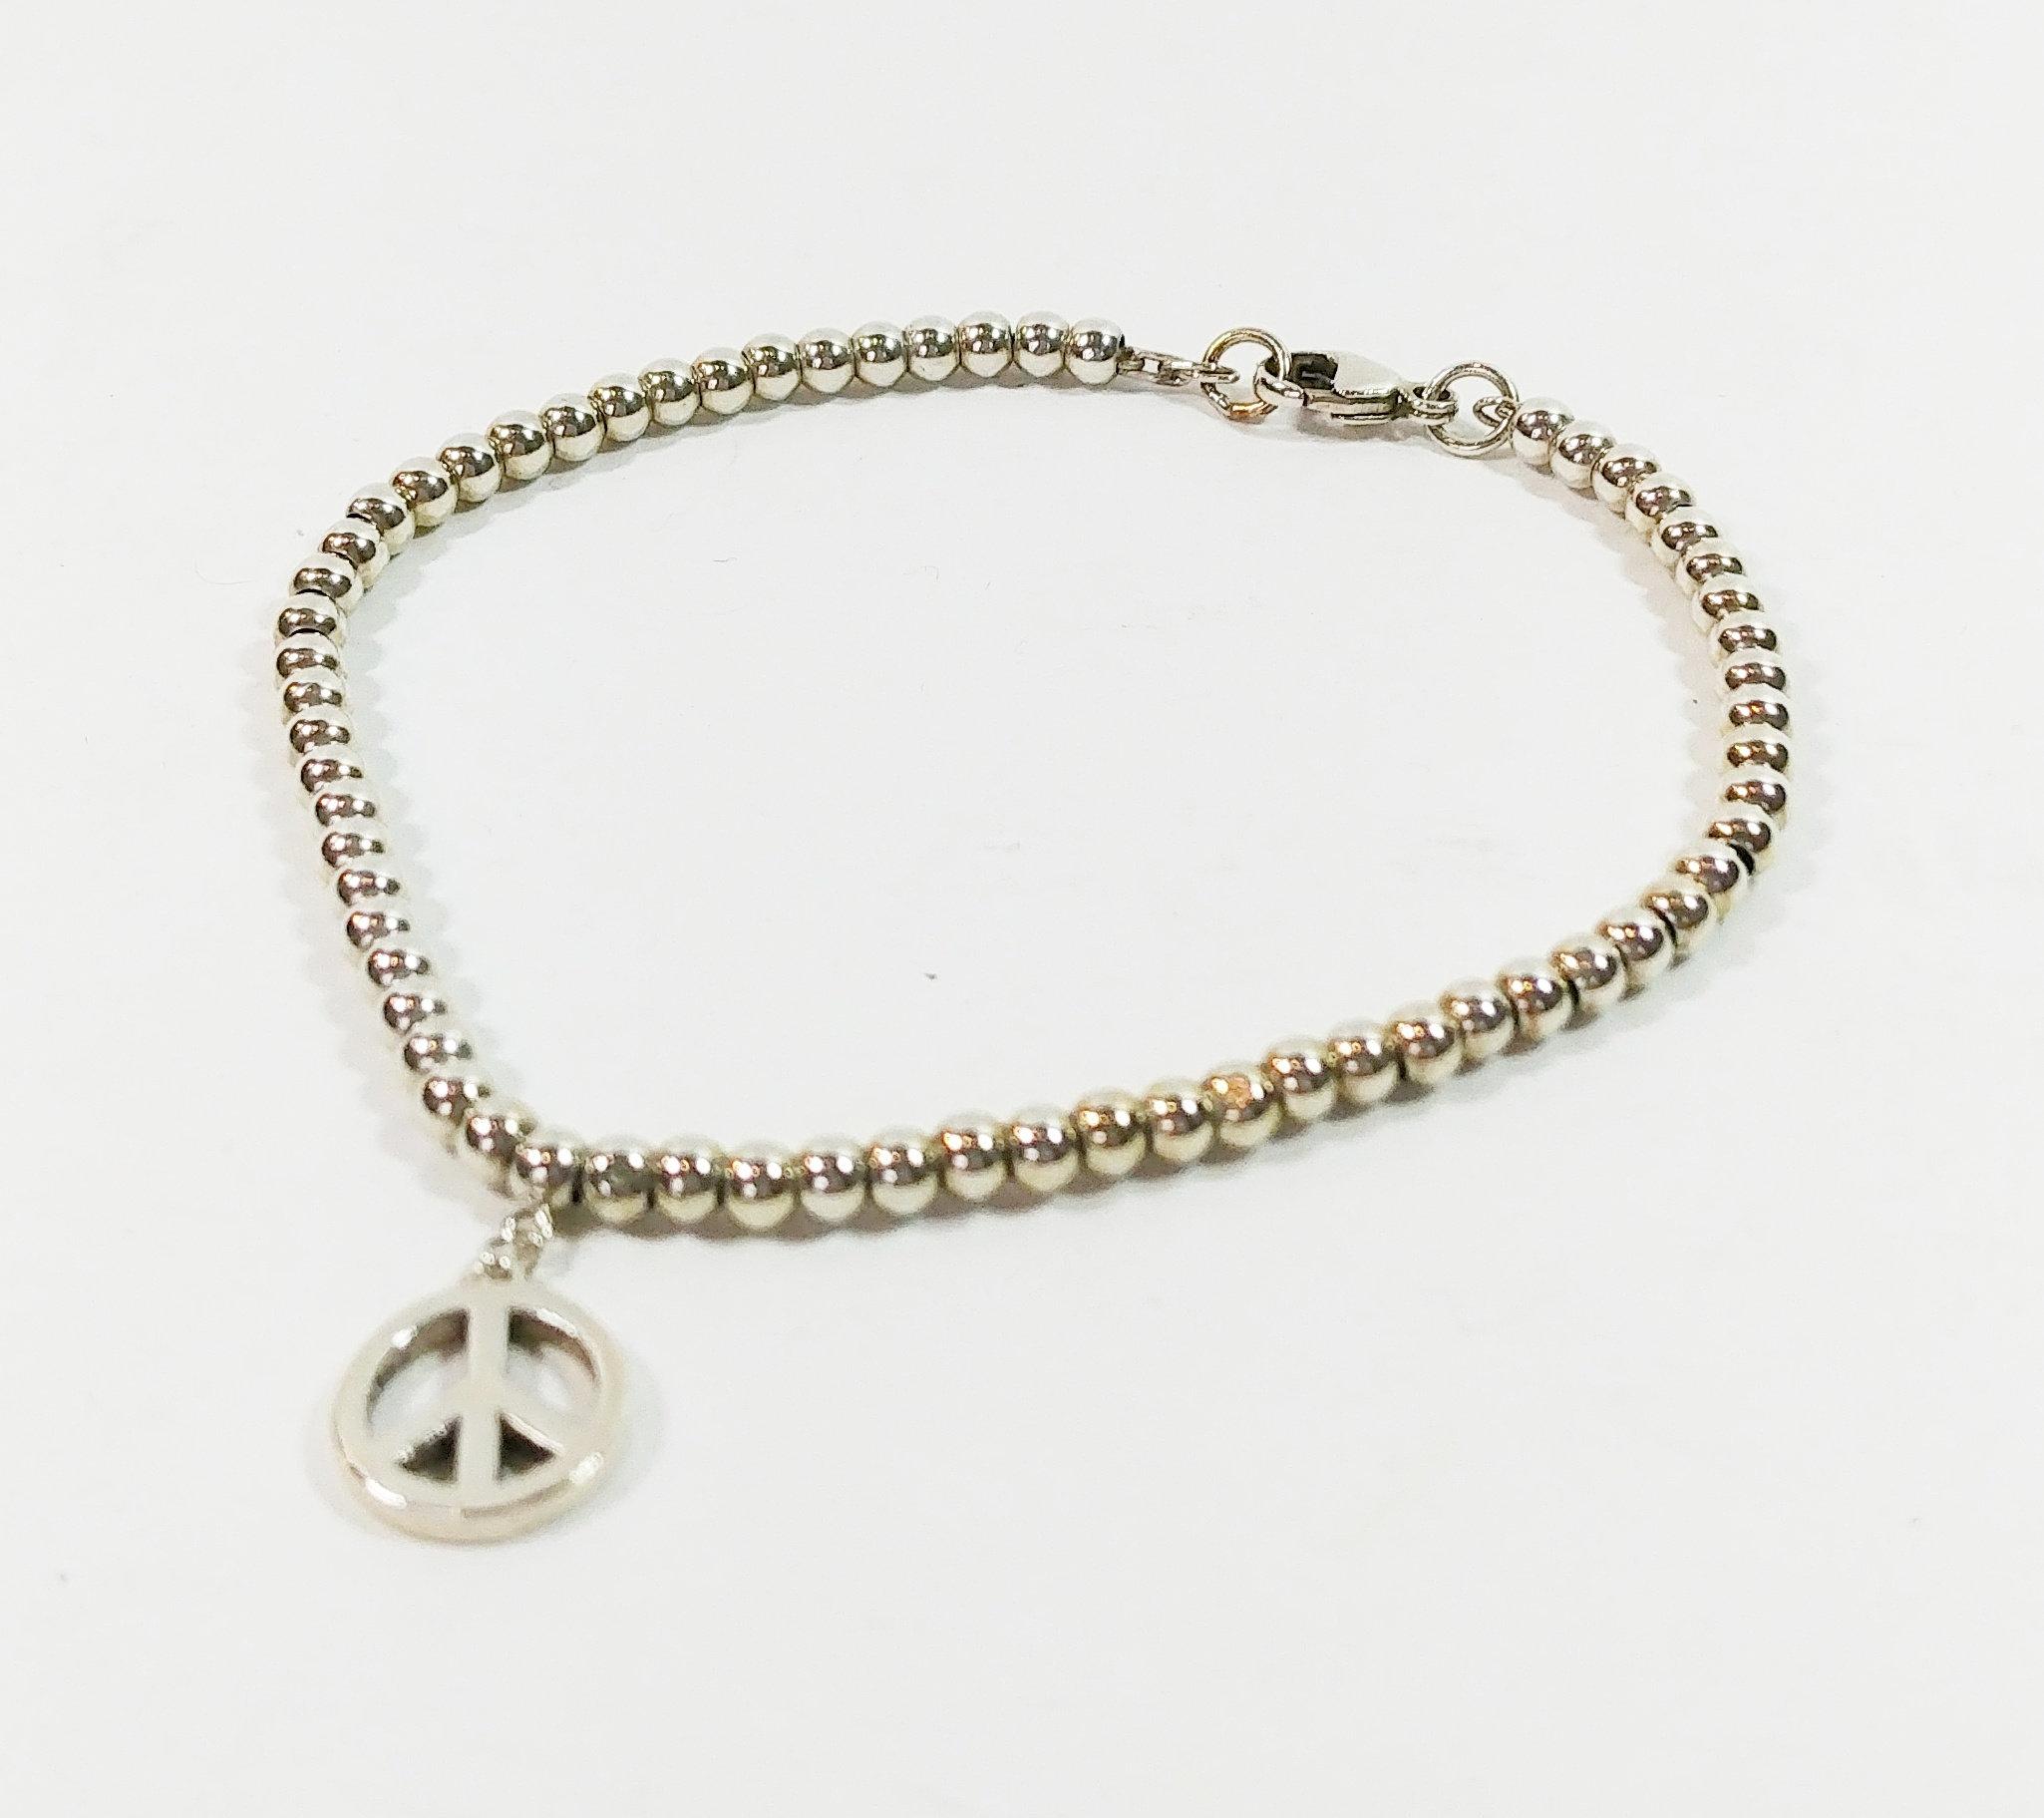 f8bd435b832fa Tiffany & Co. Beads Bracelet Small Peace Sign | hazelilly